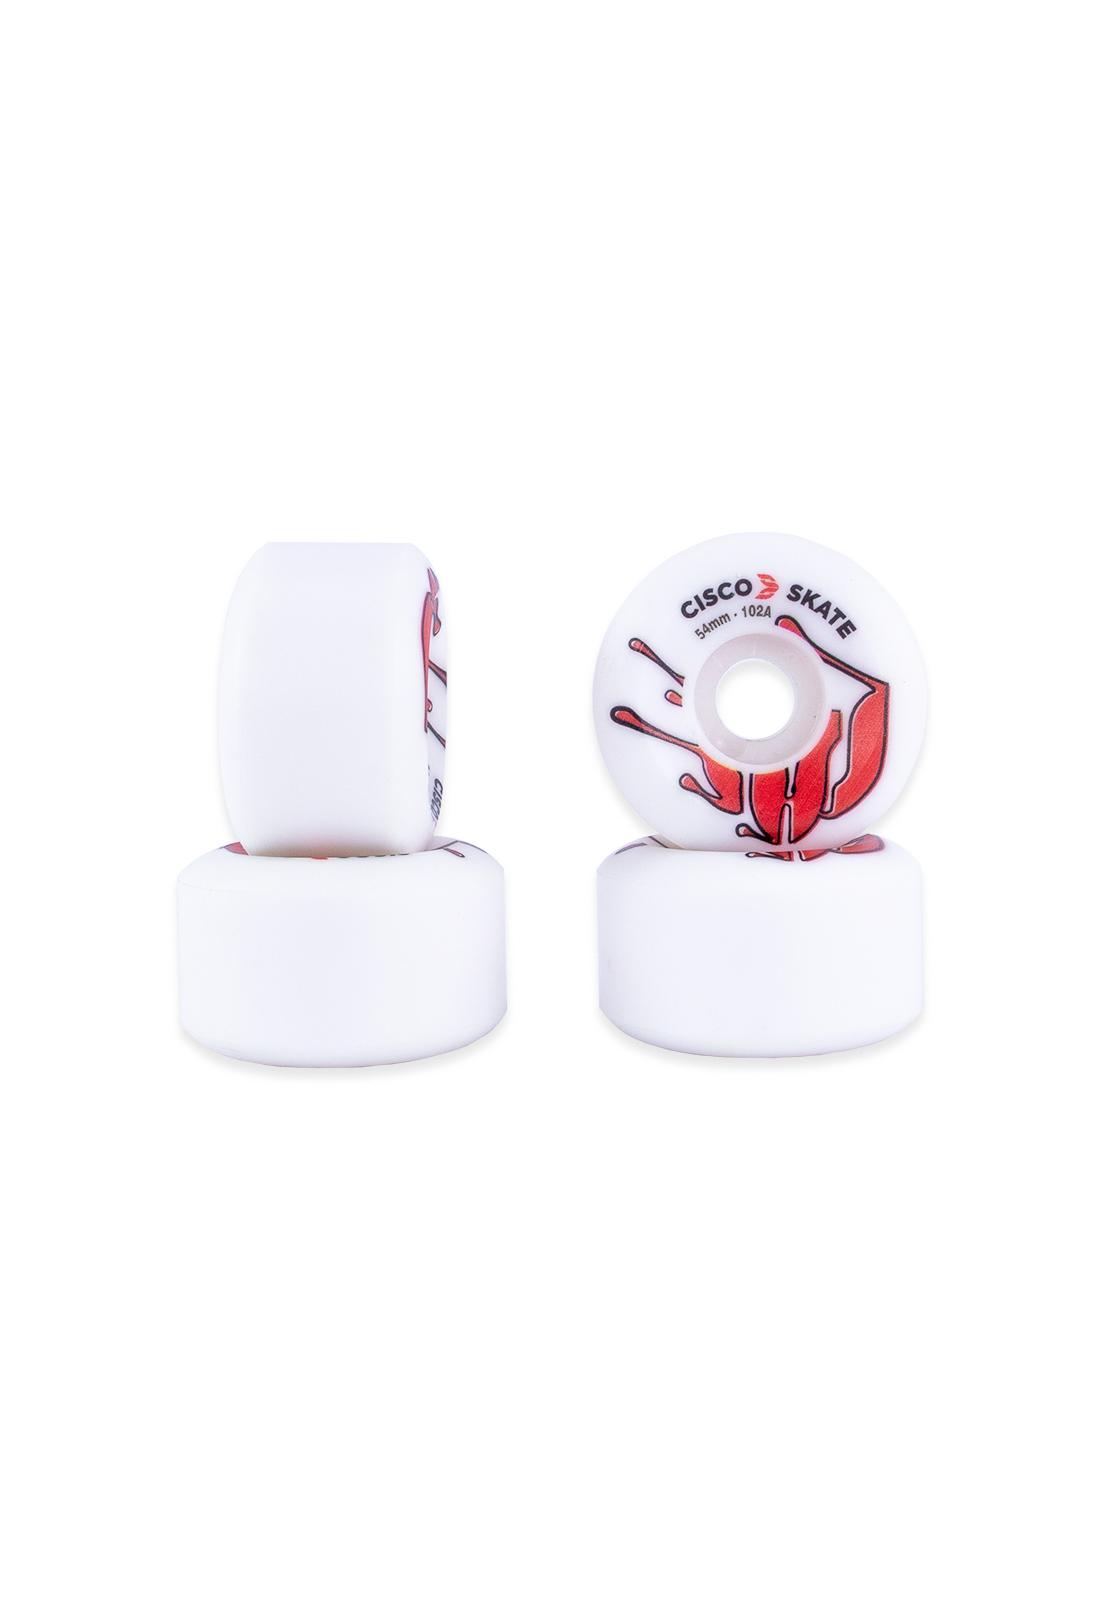 Roda Cisco Skate 54mm Fundida Premium Red 102A